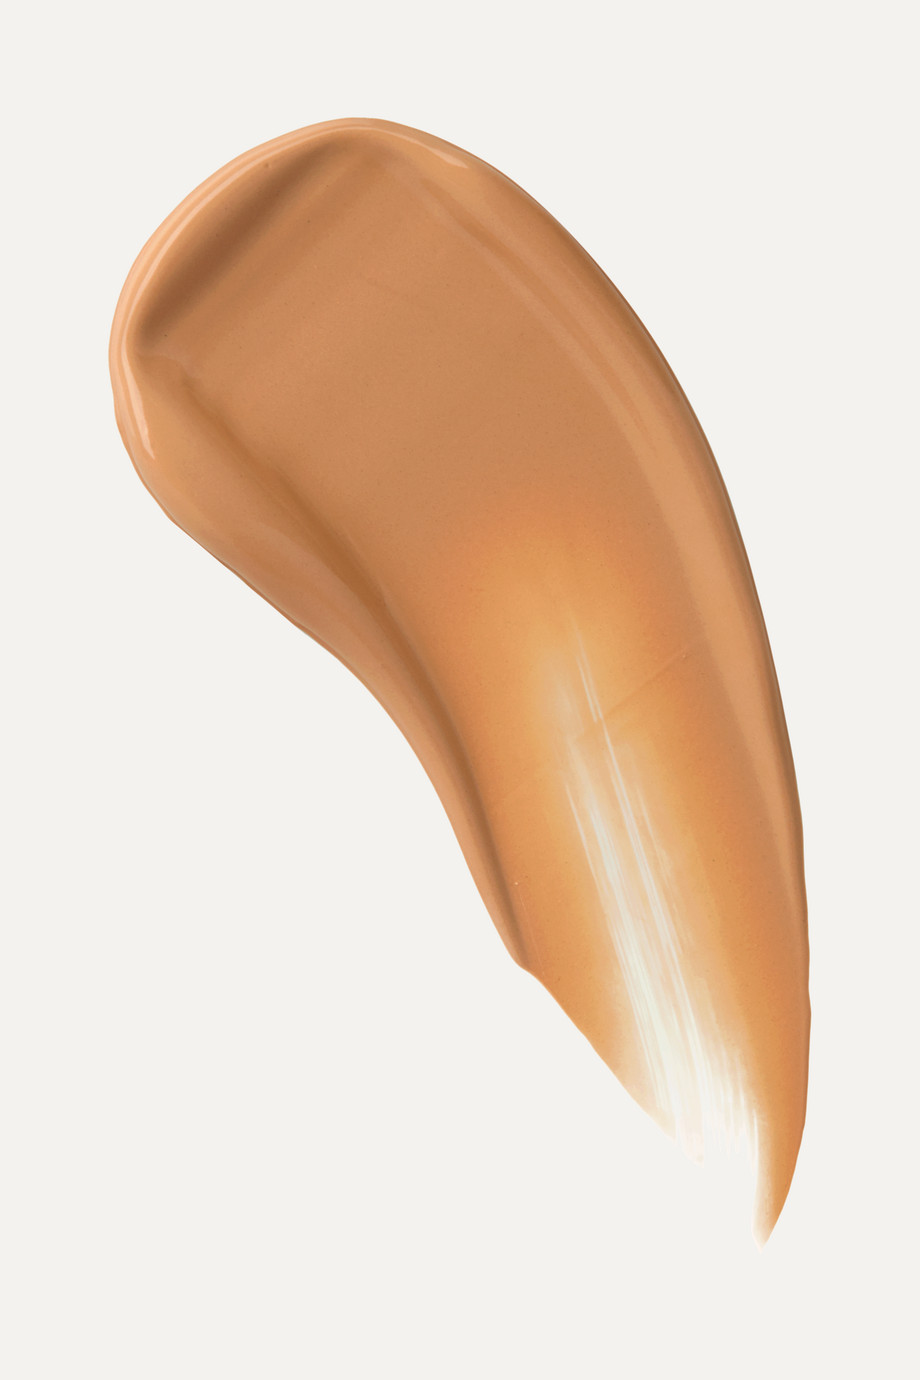 Charlotte Tilbury Magic Foundation Flawless Long-Lasting Coverage SPF15 - Shade 8, 30ml